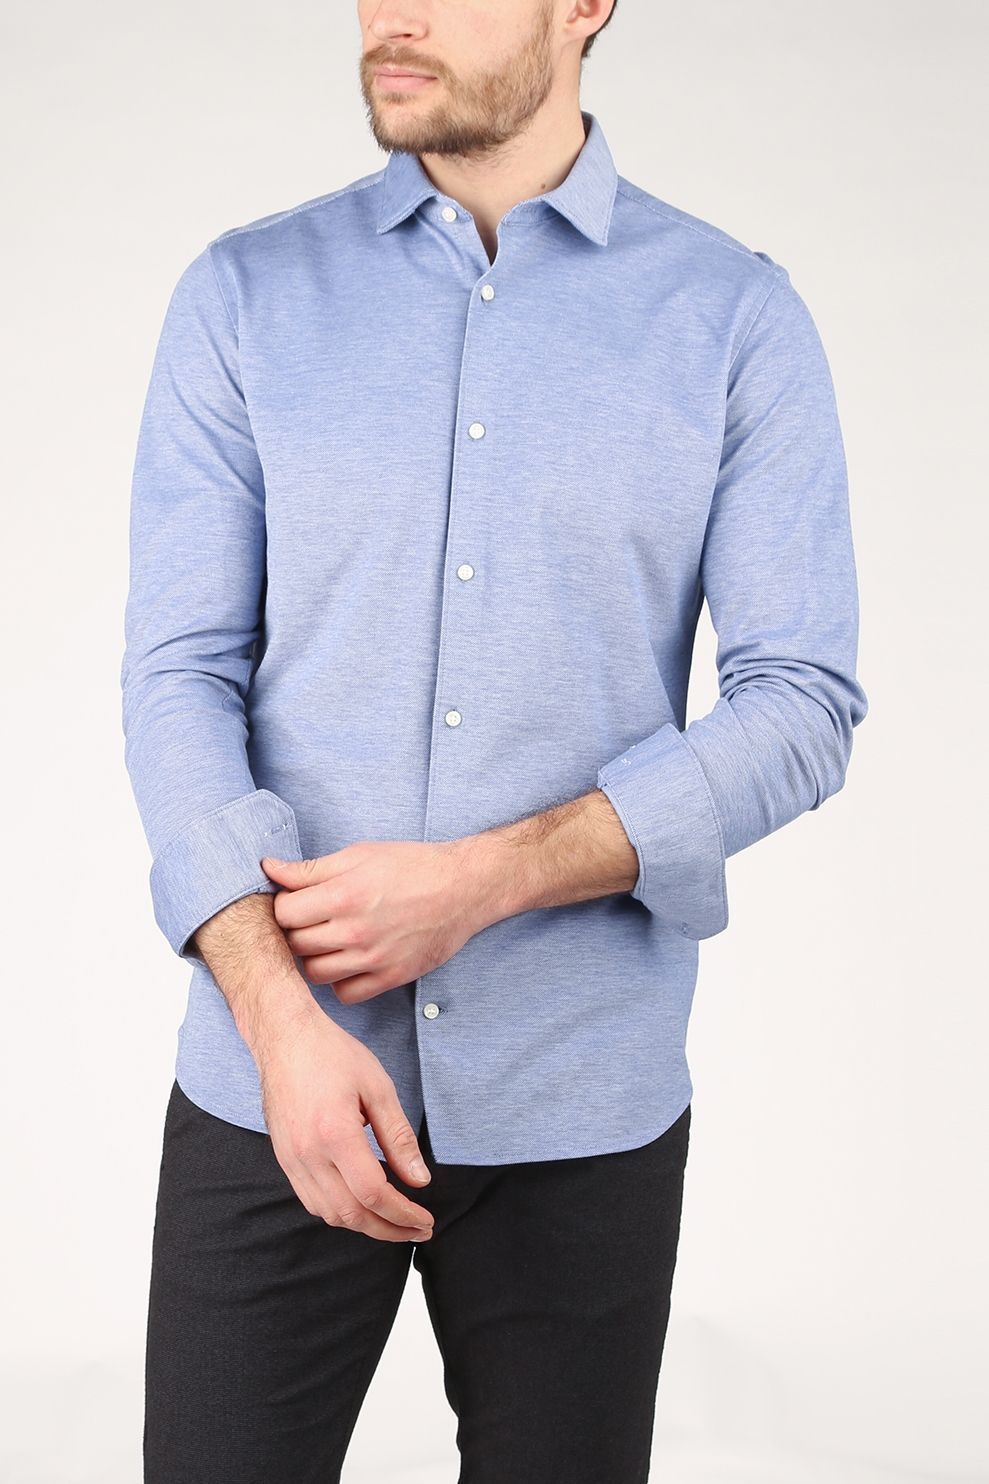 Premium Hemd Jprblaknit Oxford L/S Noos voor heren - Blauw - Maten: S, M, L, XL, XXL